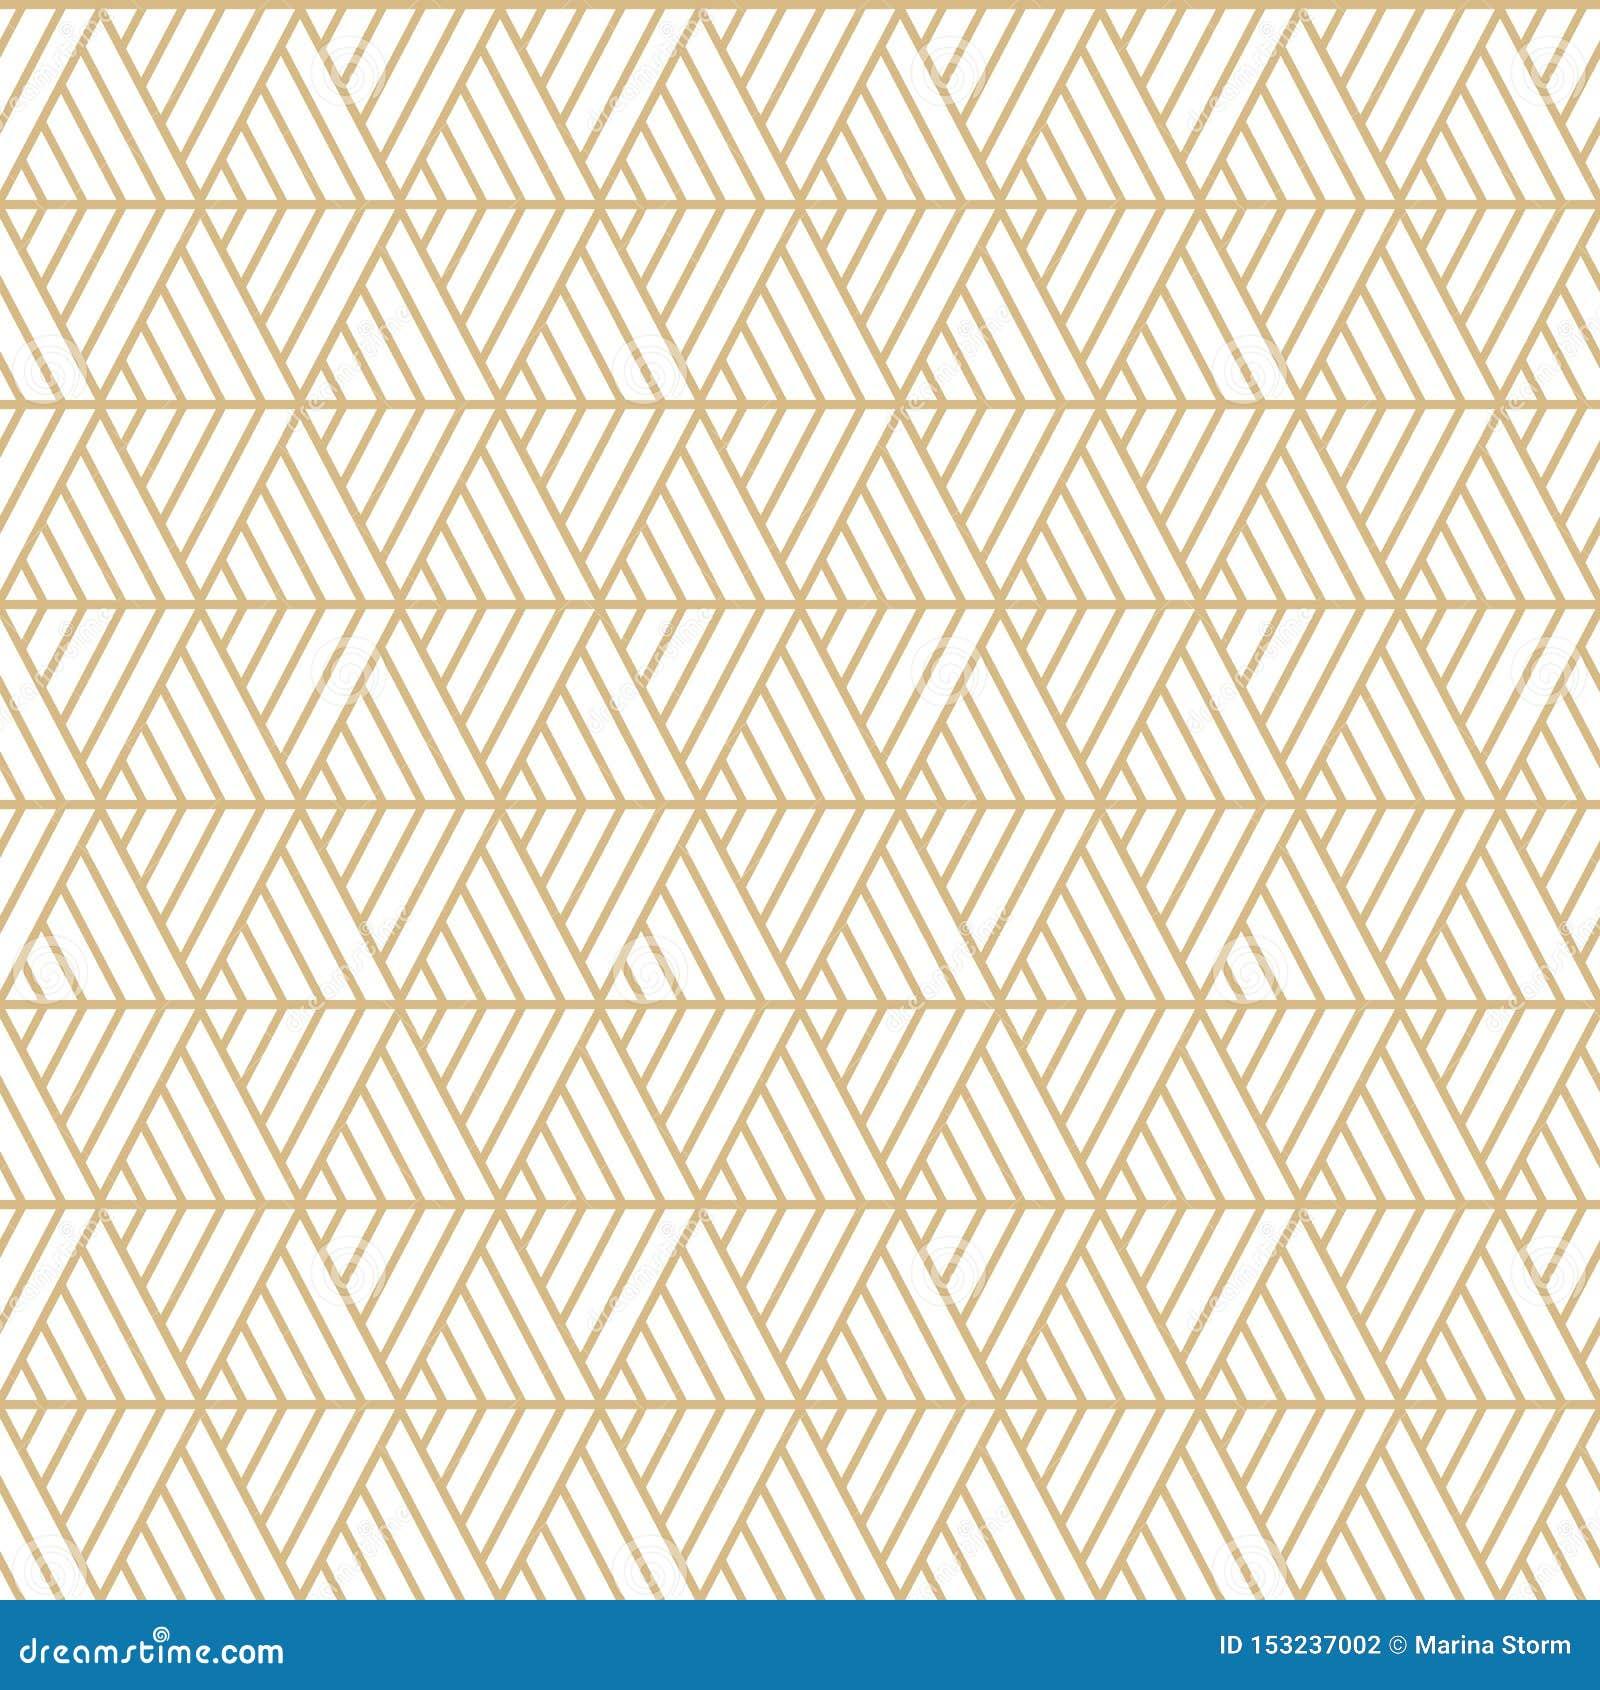 Vector seamless triangles pattern maori, ethnic, japan style. Modern style texture.